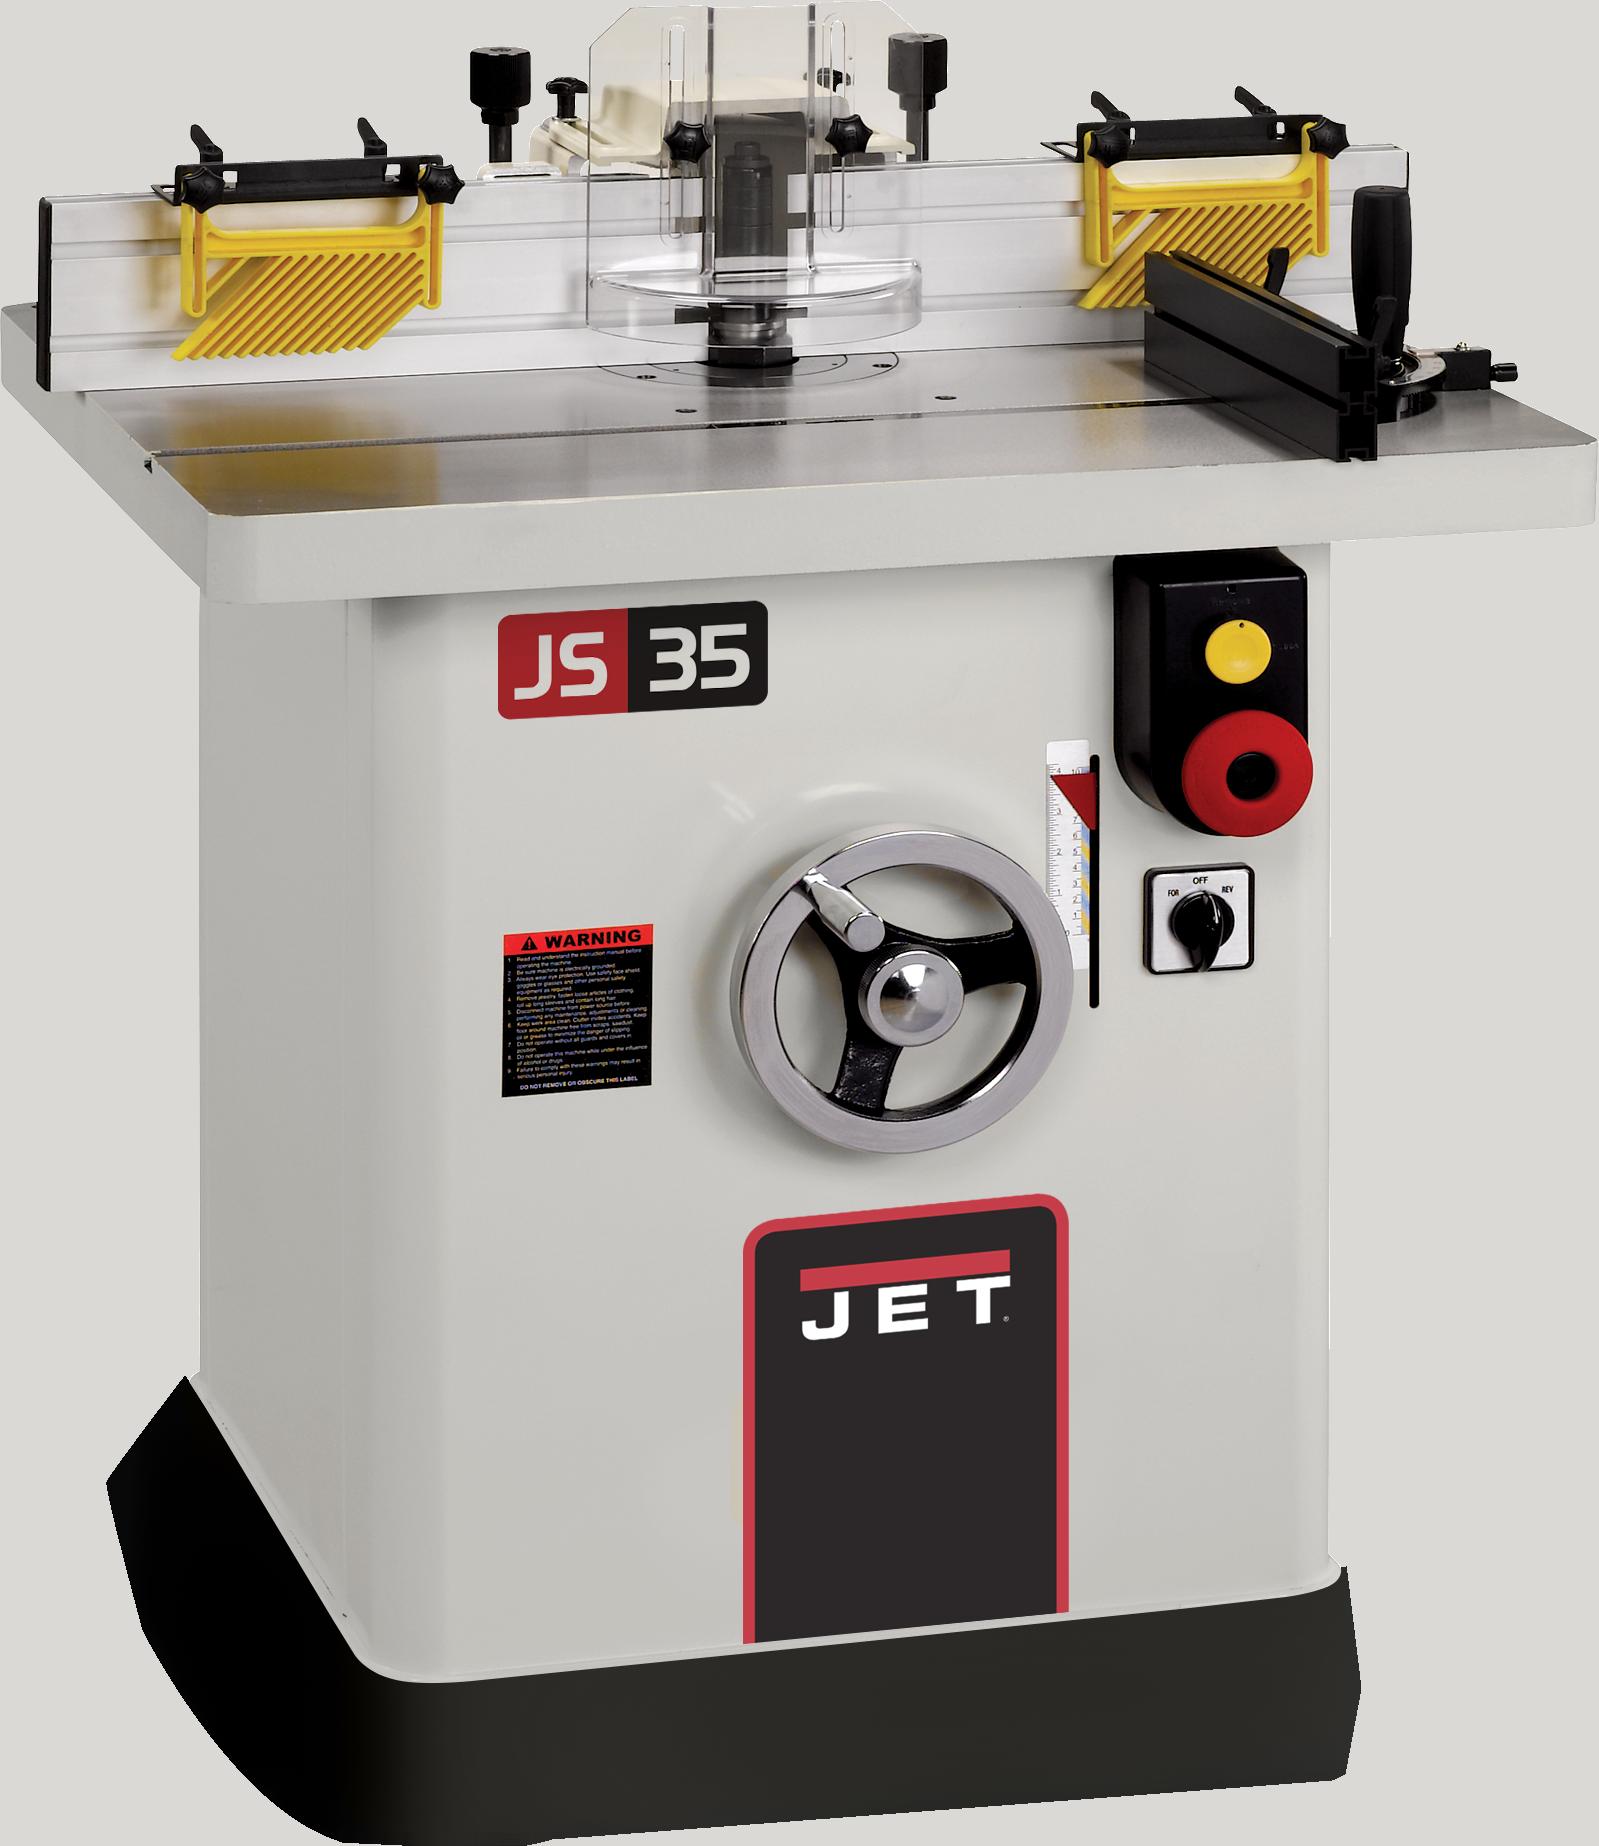 JWS-35X3-1 Shaper 3HP, 1Ph